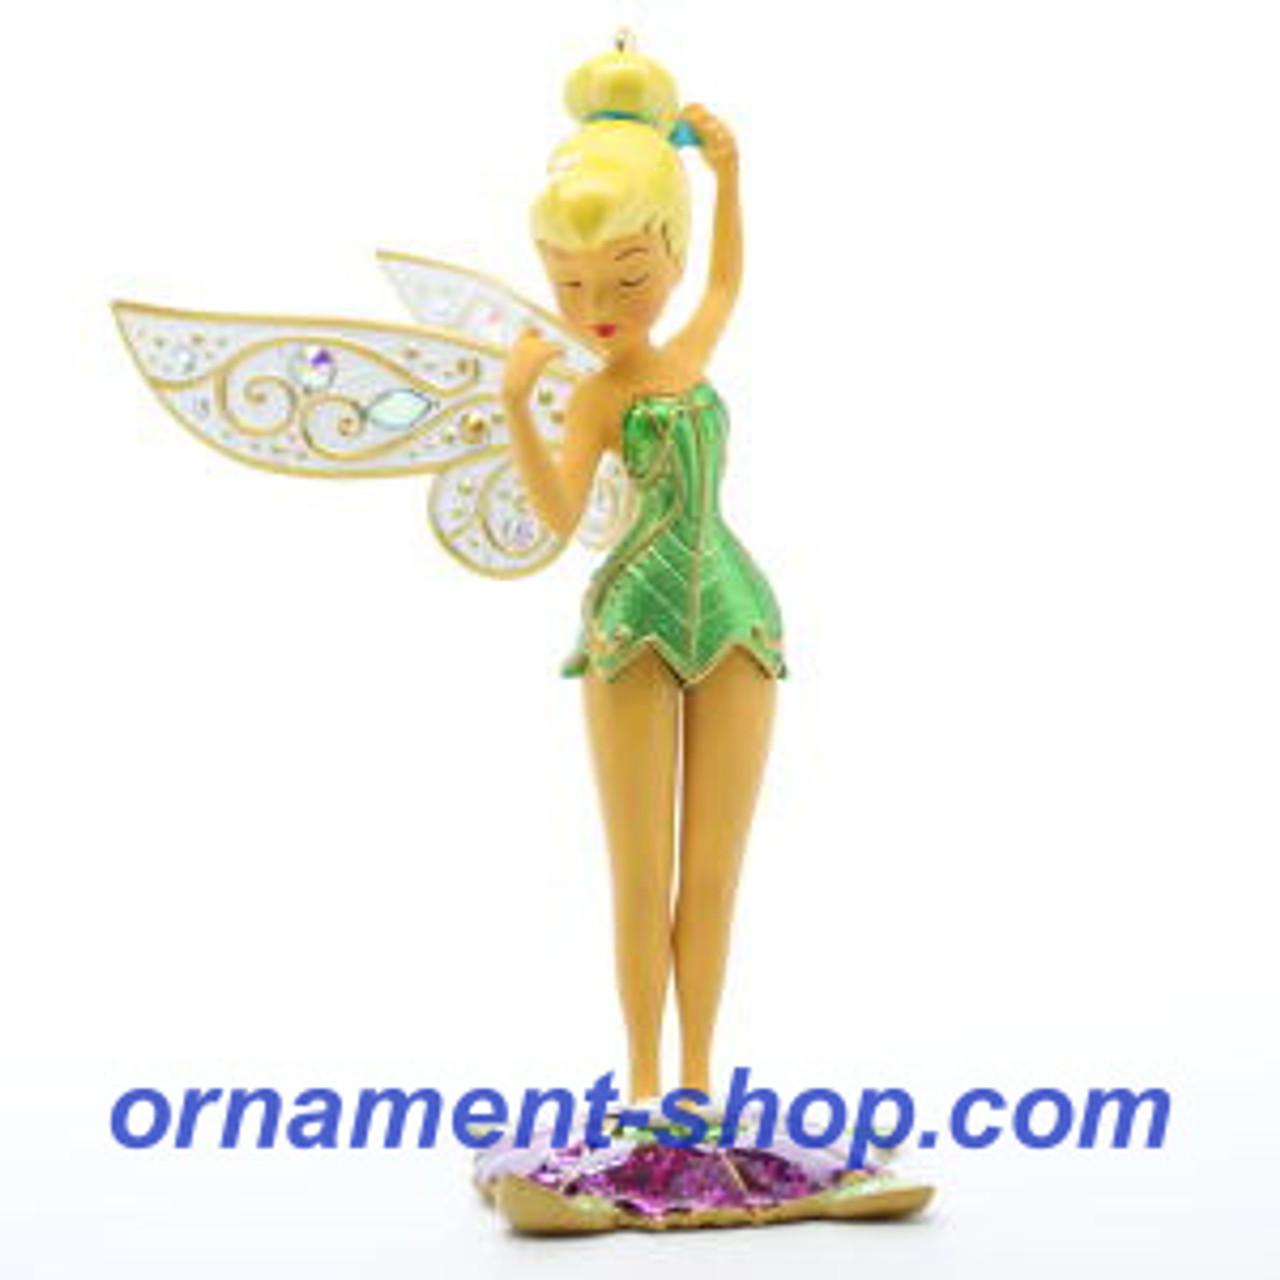 NEW 2012 Hallmark PEEKING PIXIE Disney/'s Peter Pan TINKER BELL Fairy Ornament